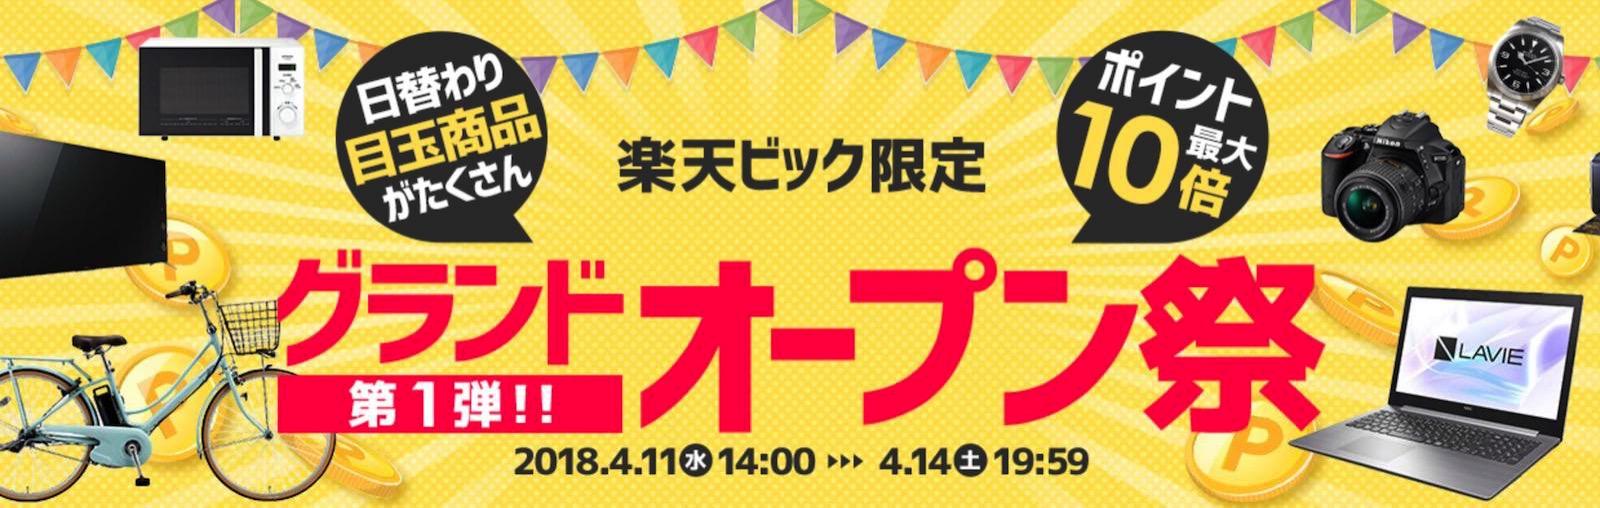 Rakuten campaign 2